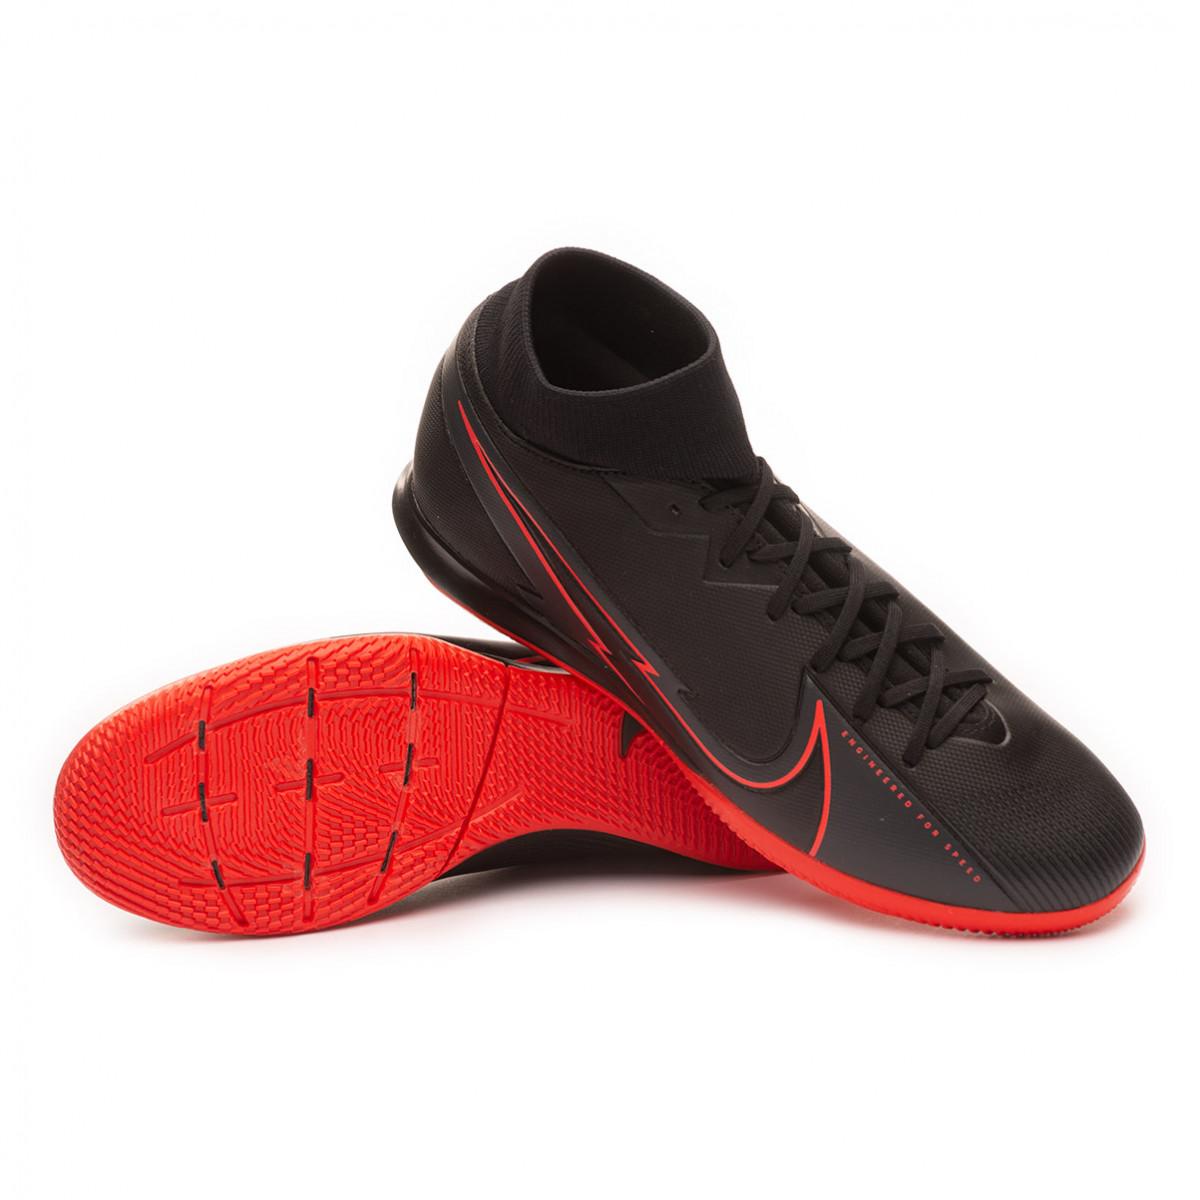 Sentimiento de culpa Hombre rico personalizado  Futsal Boot Nike Mercurial Superfly VII Academy IC Black-Black-Dark smoke  grey-Chile red - Football store Fútbol Emotion